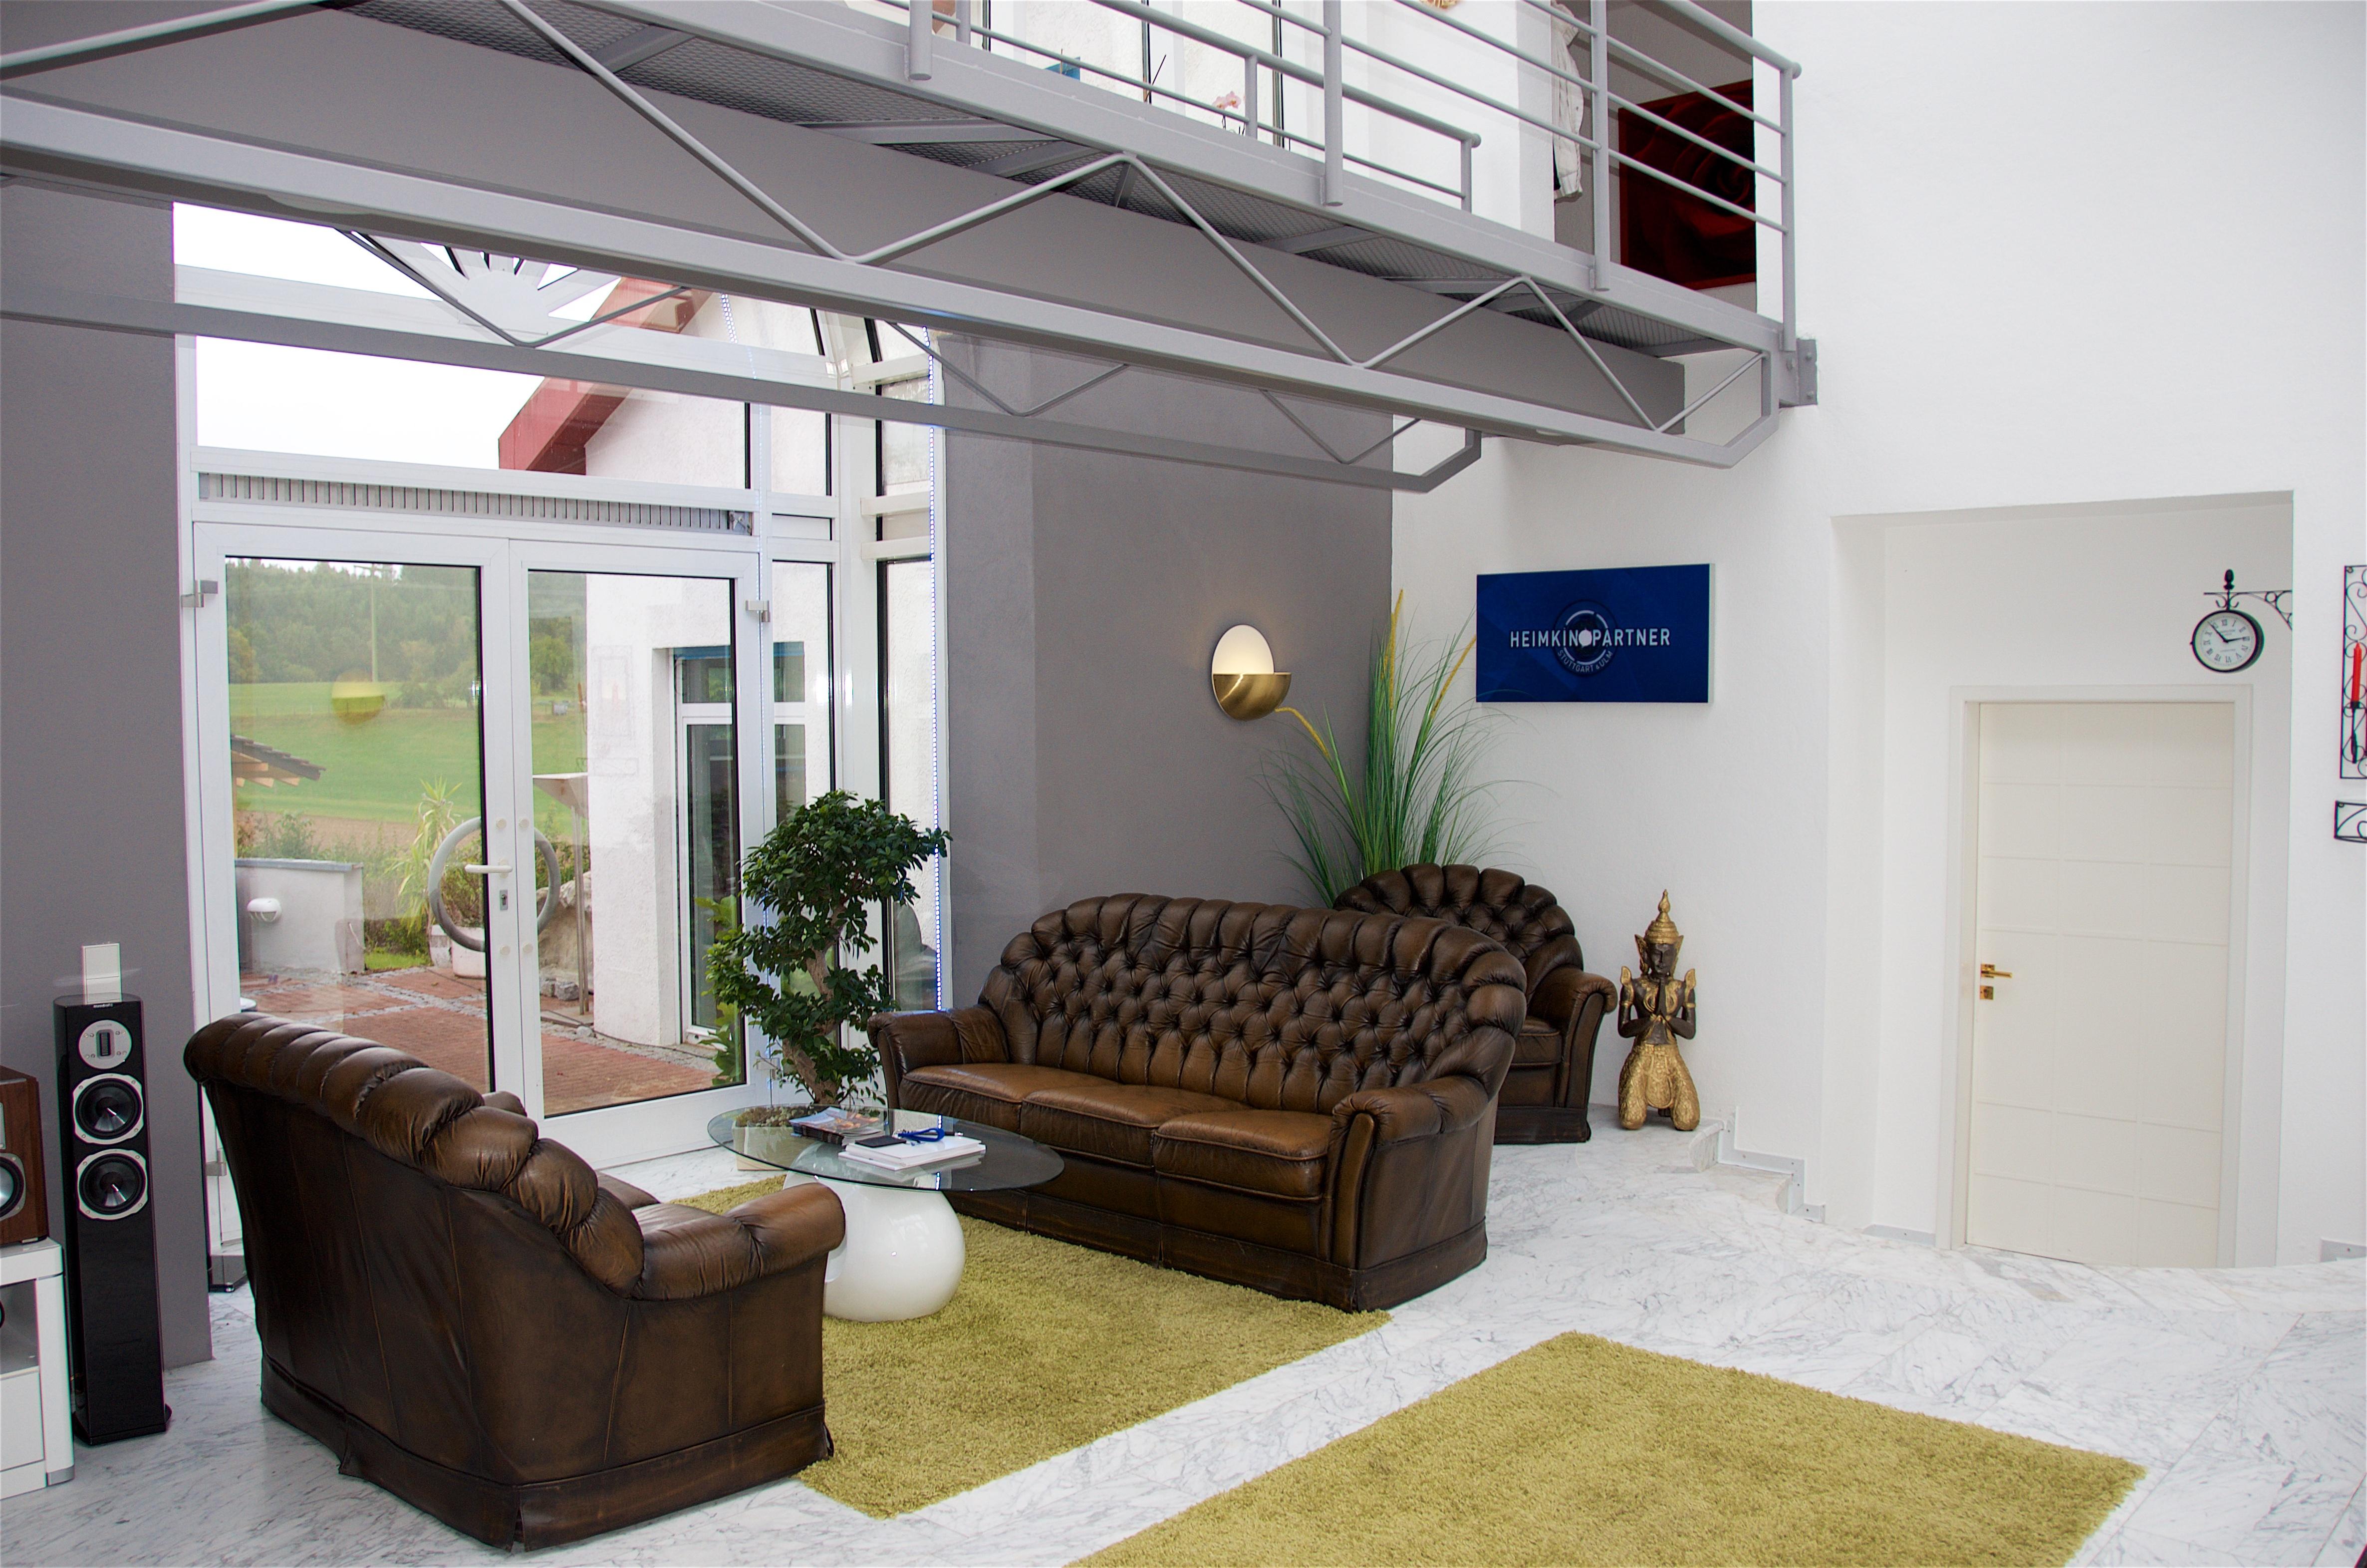 heimkino beamer stuttgart ihr fachhandel vor ort. Black Bedroom Furniture Sets. Home Design Ideas